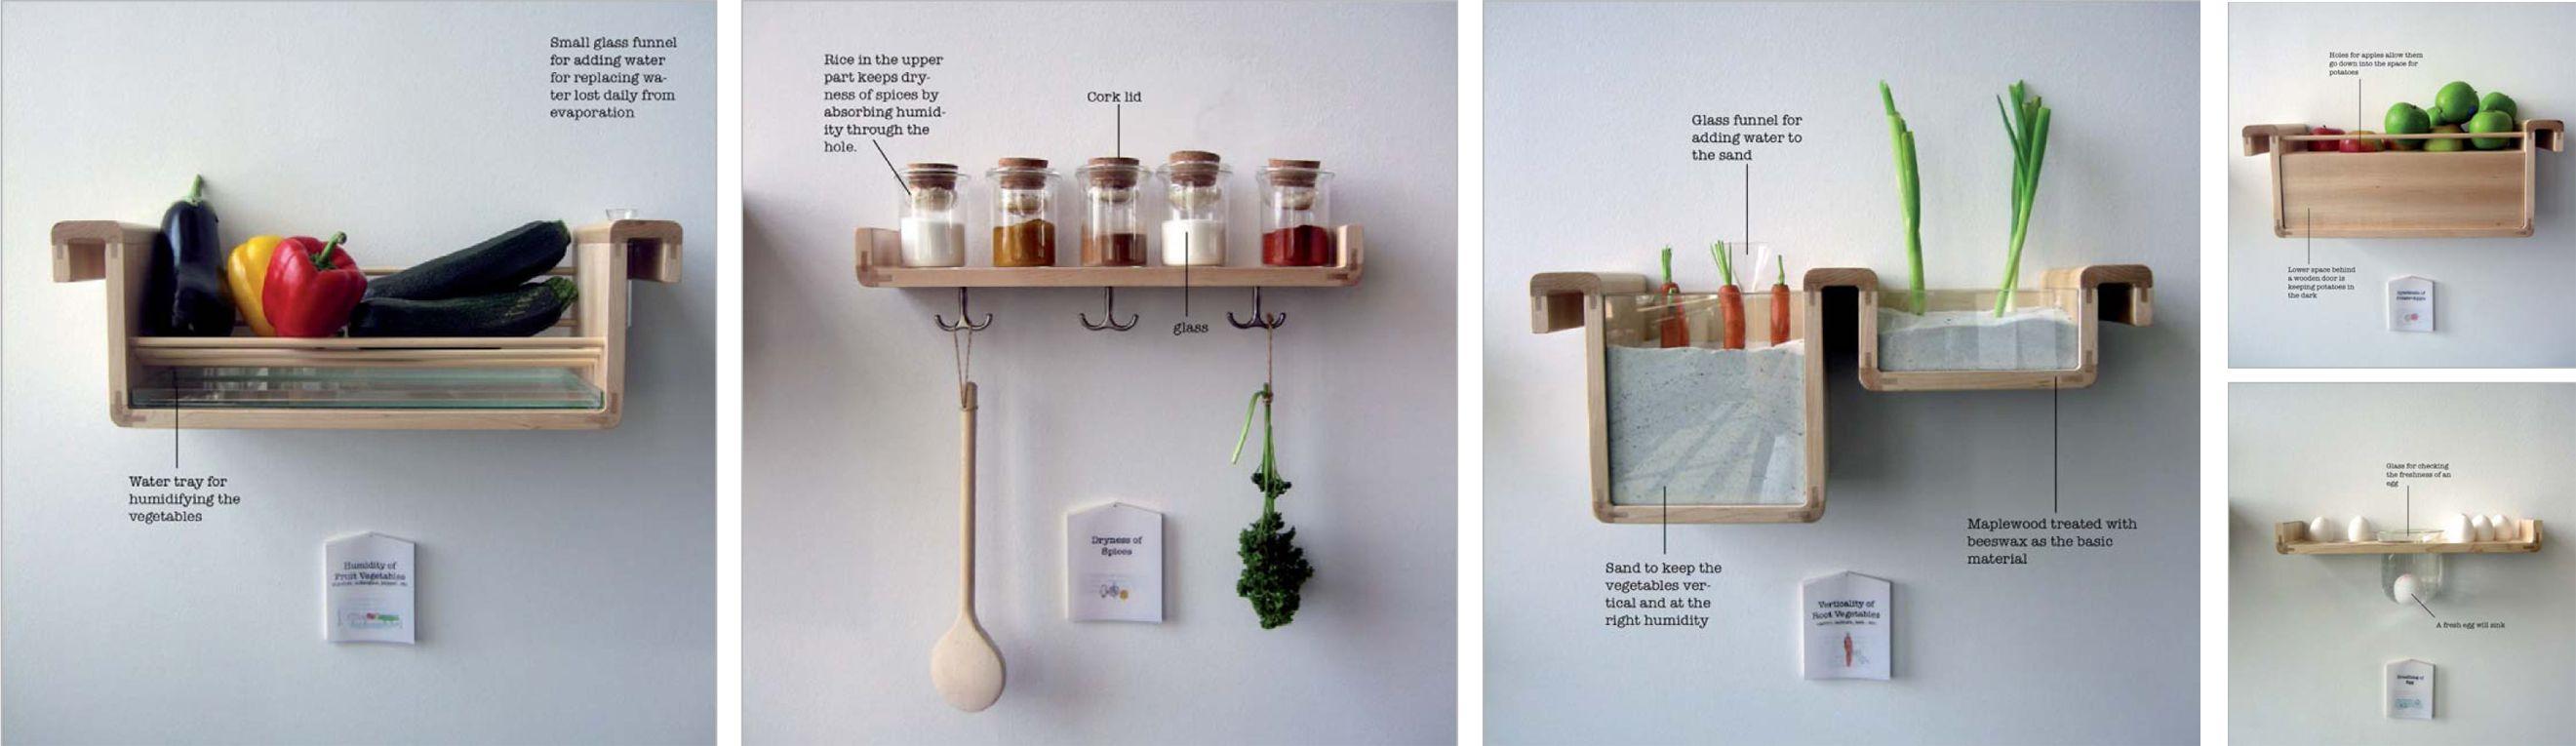 Pin by NAOMI KIZHNER on Kitch_ Bathroom medicine